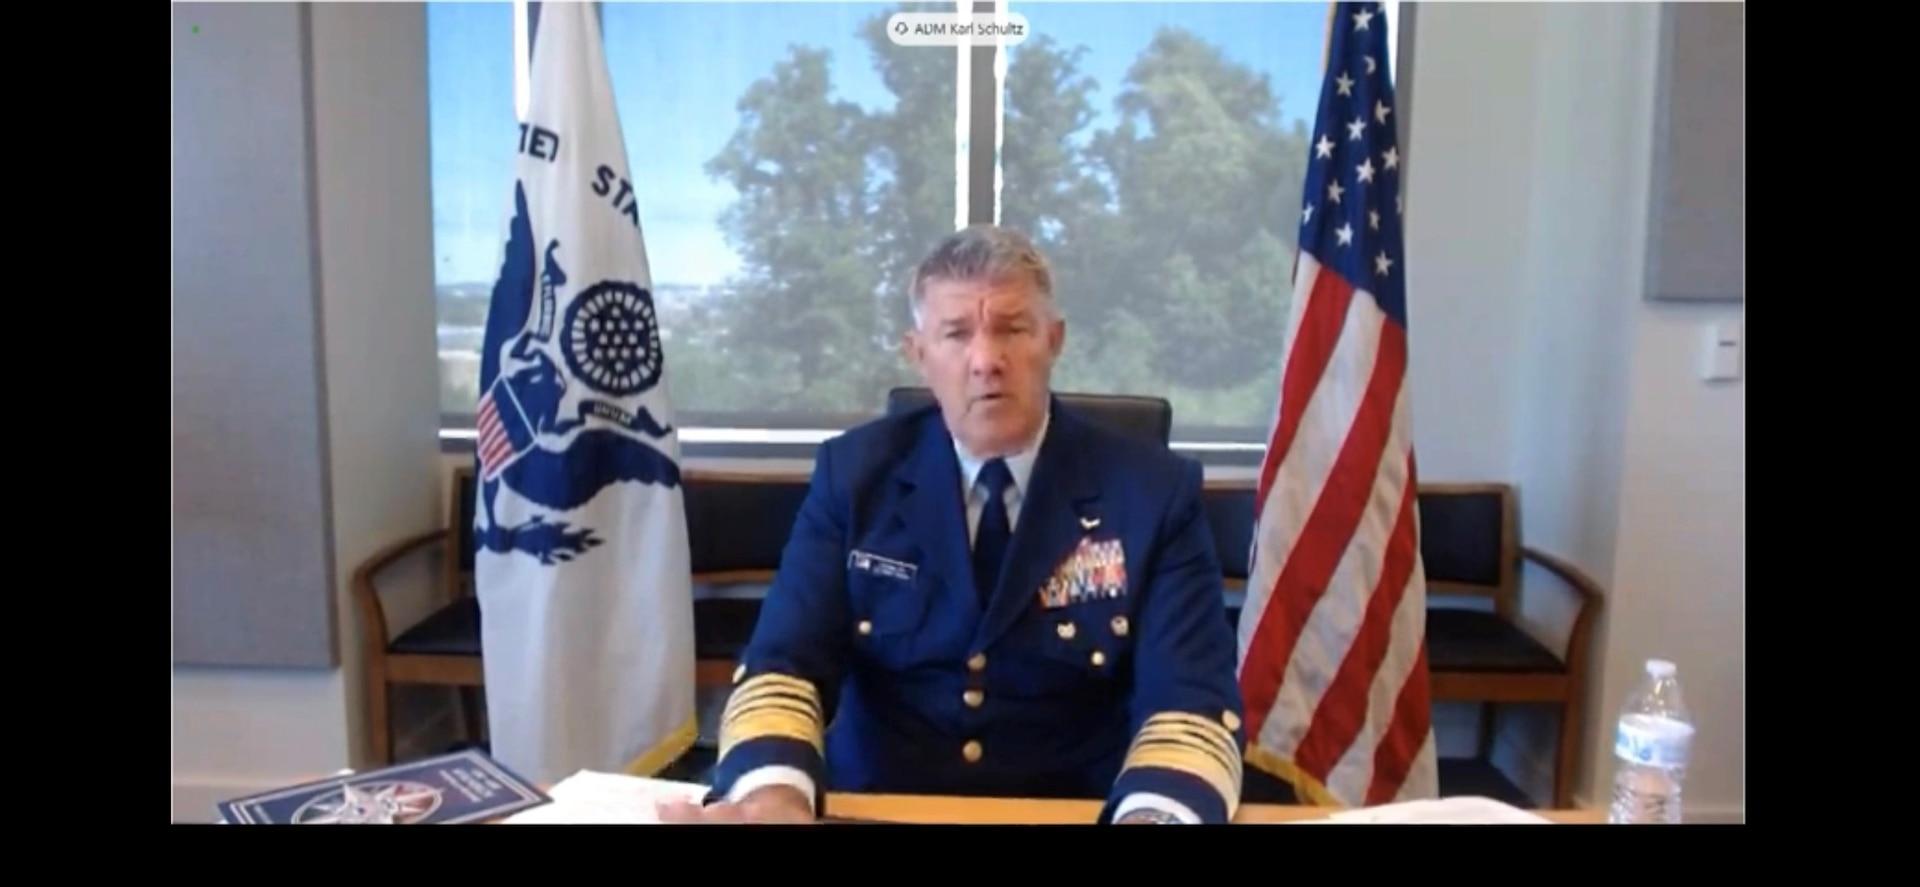 Adm Karl Schultz testifies before the House Committee on Homeland Security on June 23, 2021.